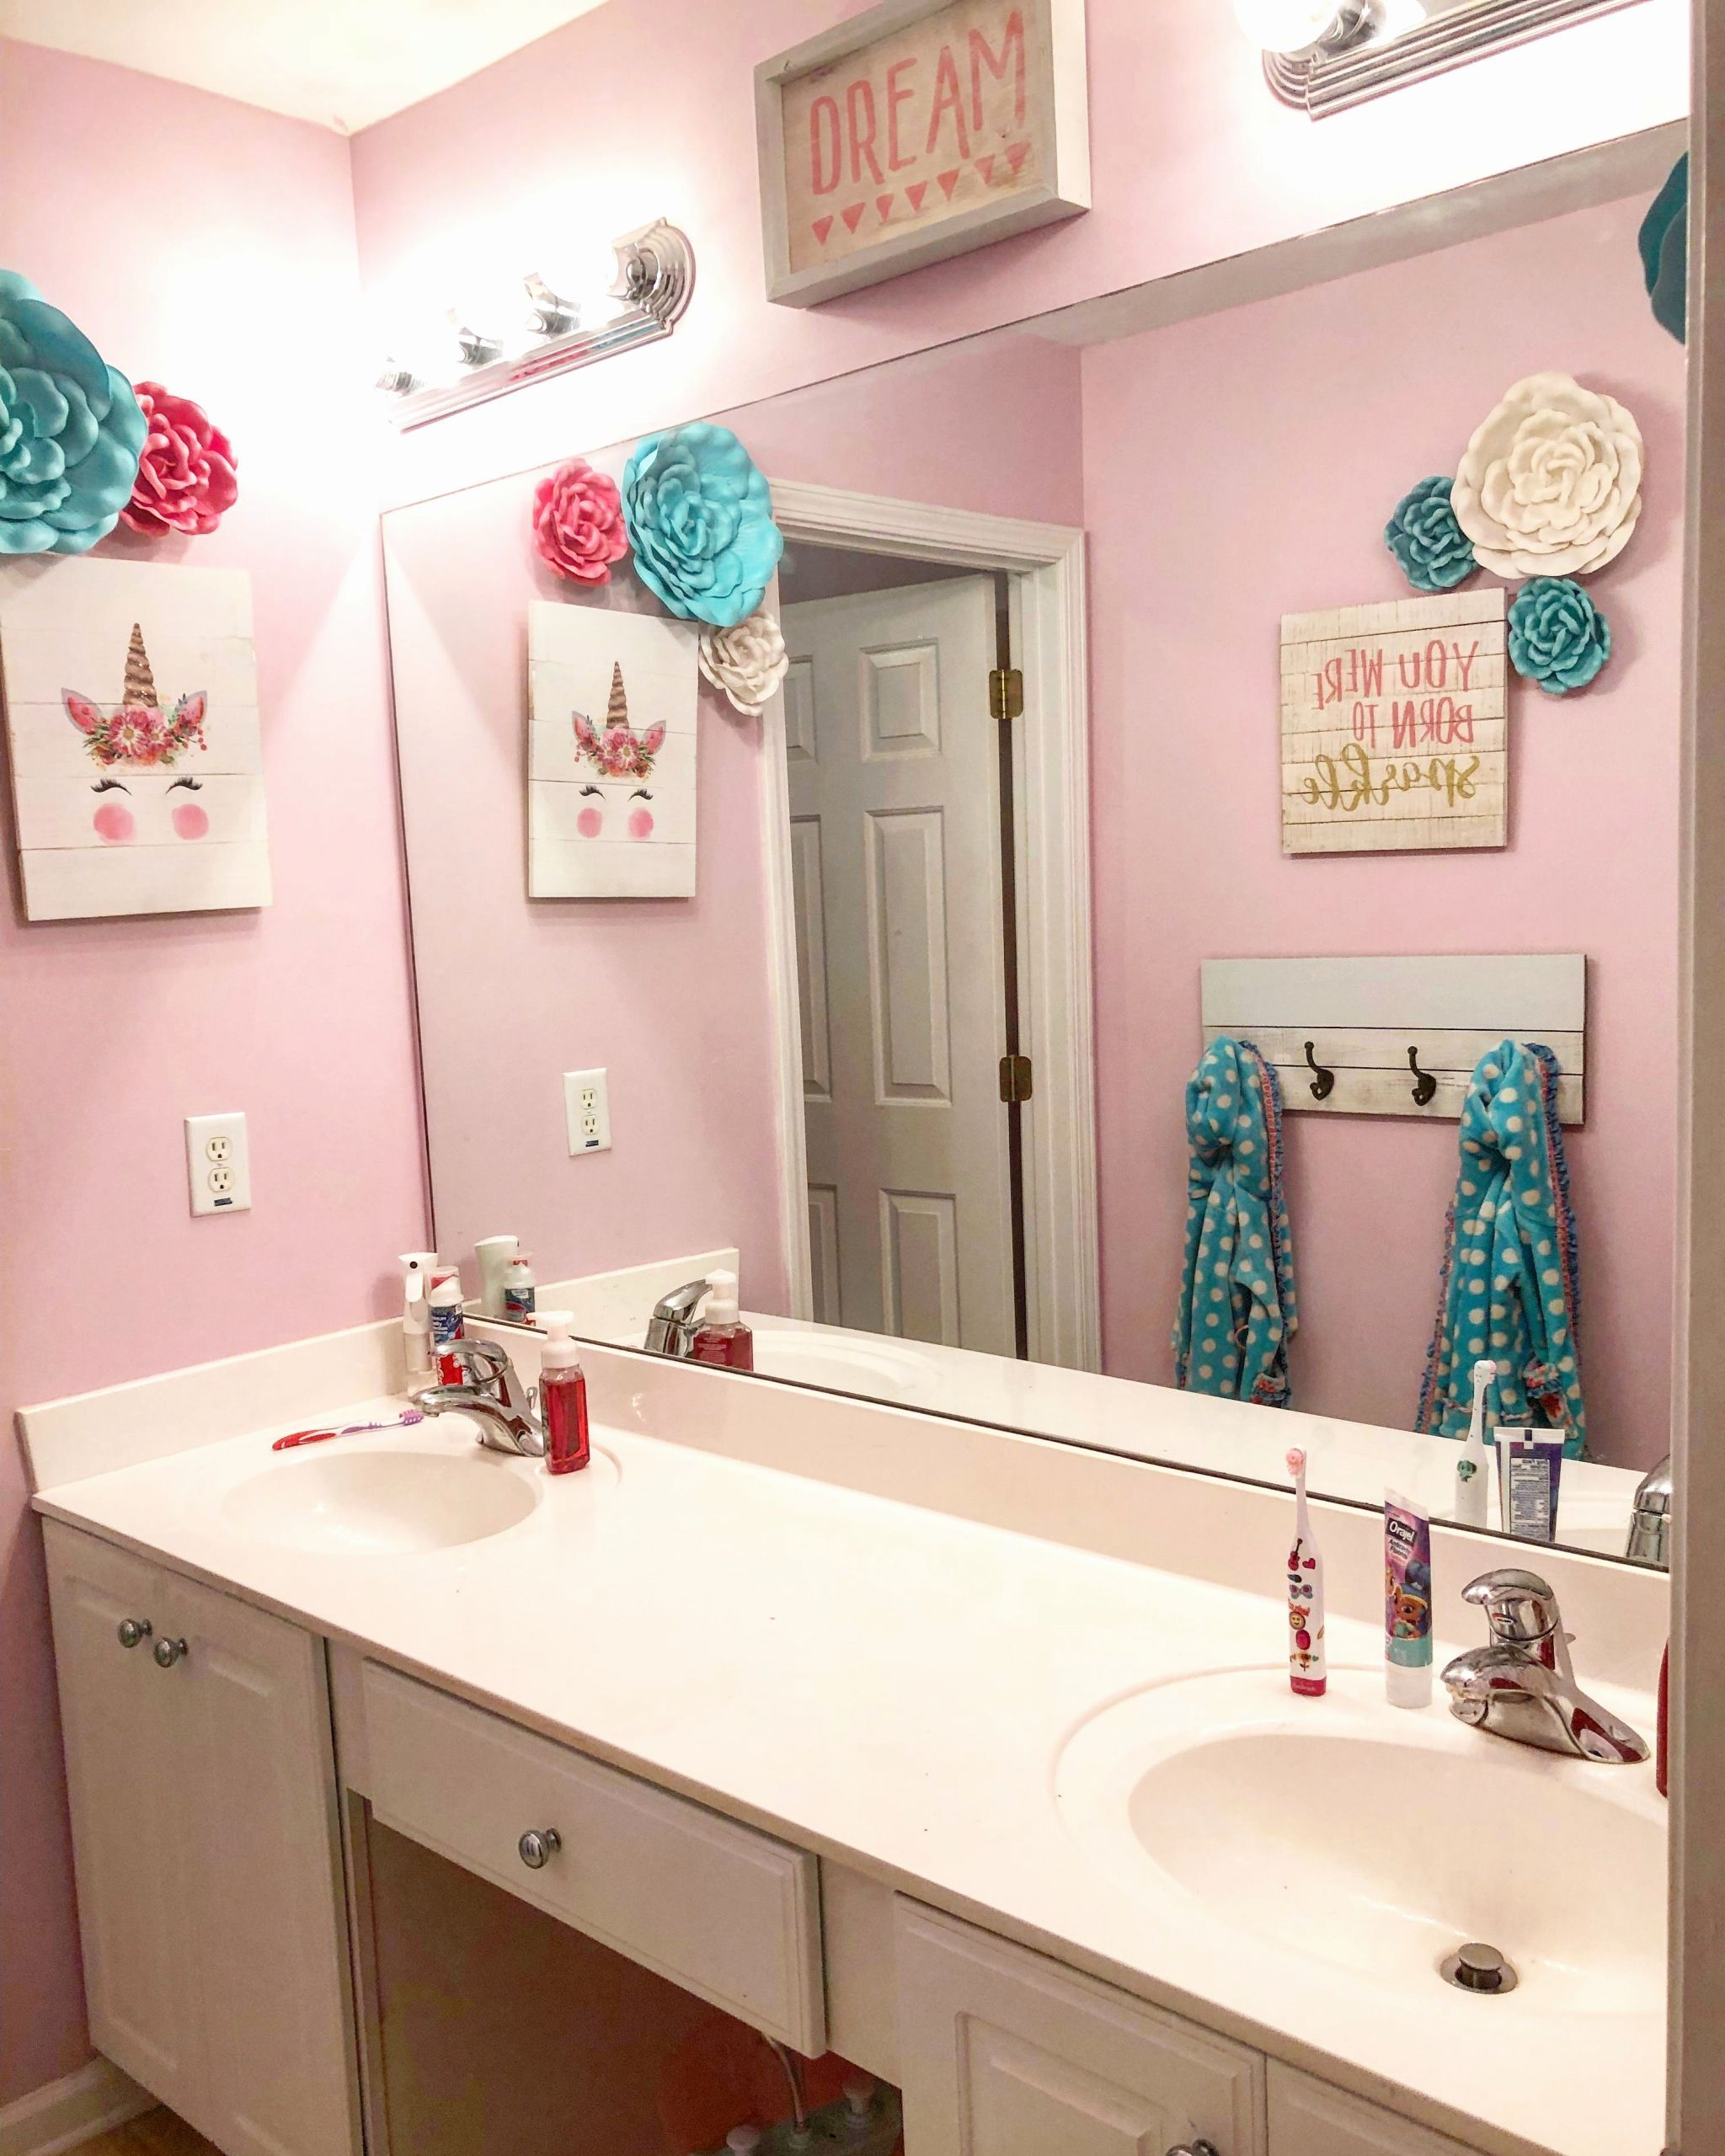 Girl Bathroom Decorating Ideas Inspirational Girls Unicorn Bathroom Girls Bathroom In 2019 In 2020 Girl Bathroom Decor Girly Bathroom Little Girl Bathrooms